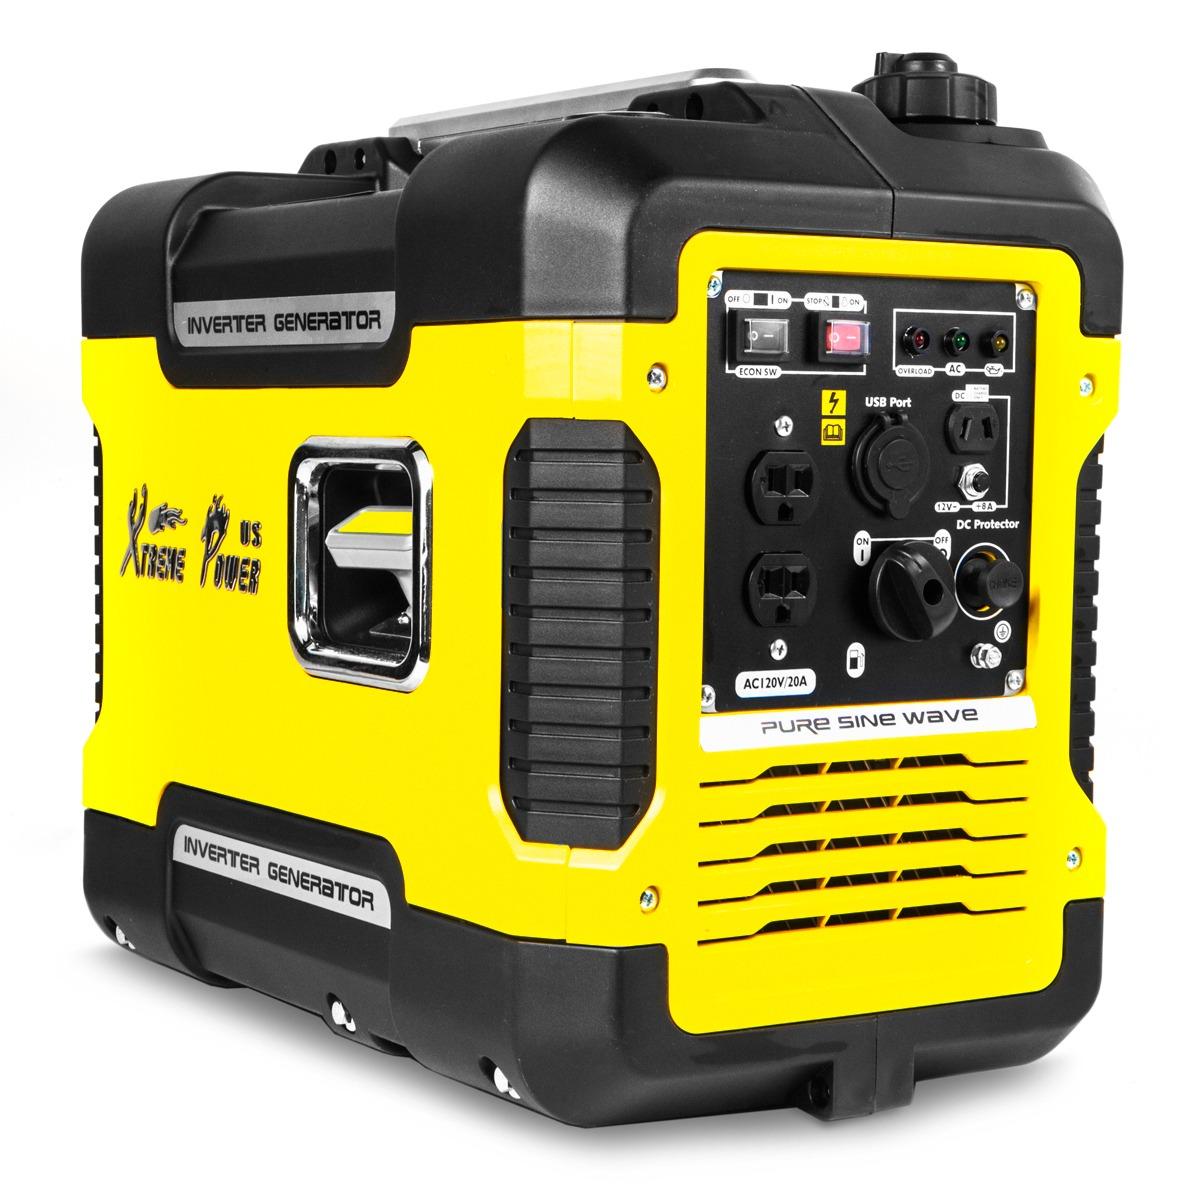 XtremepowerUS 2000 Watt Digital Portable Inverter Generator EPA CARB Approved